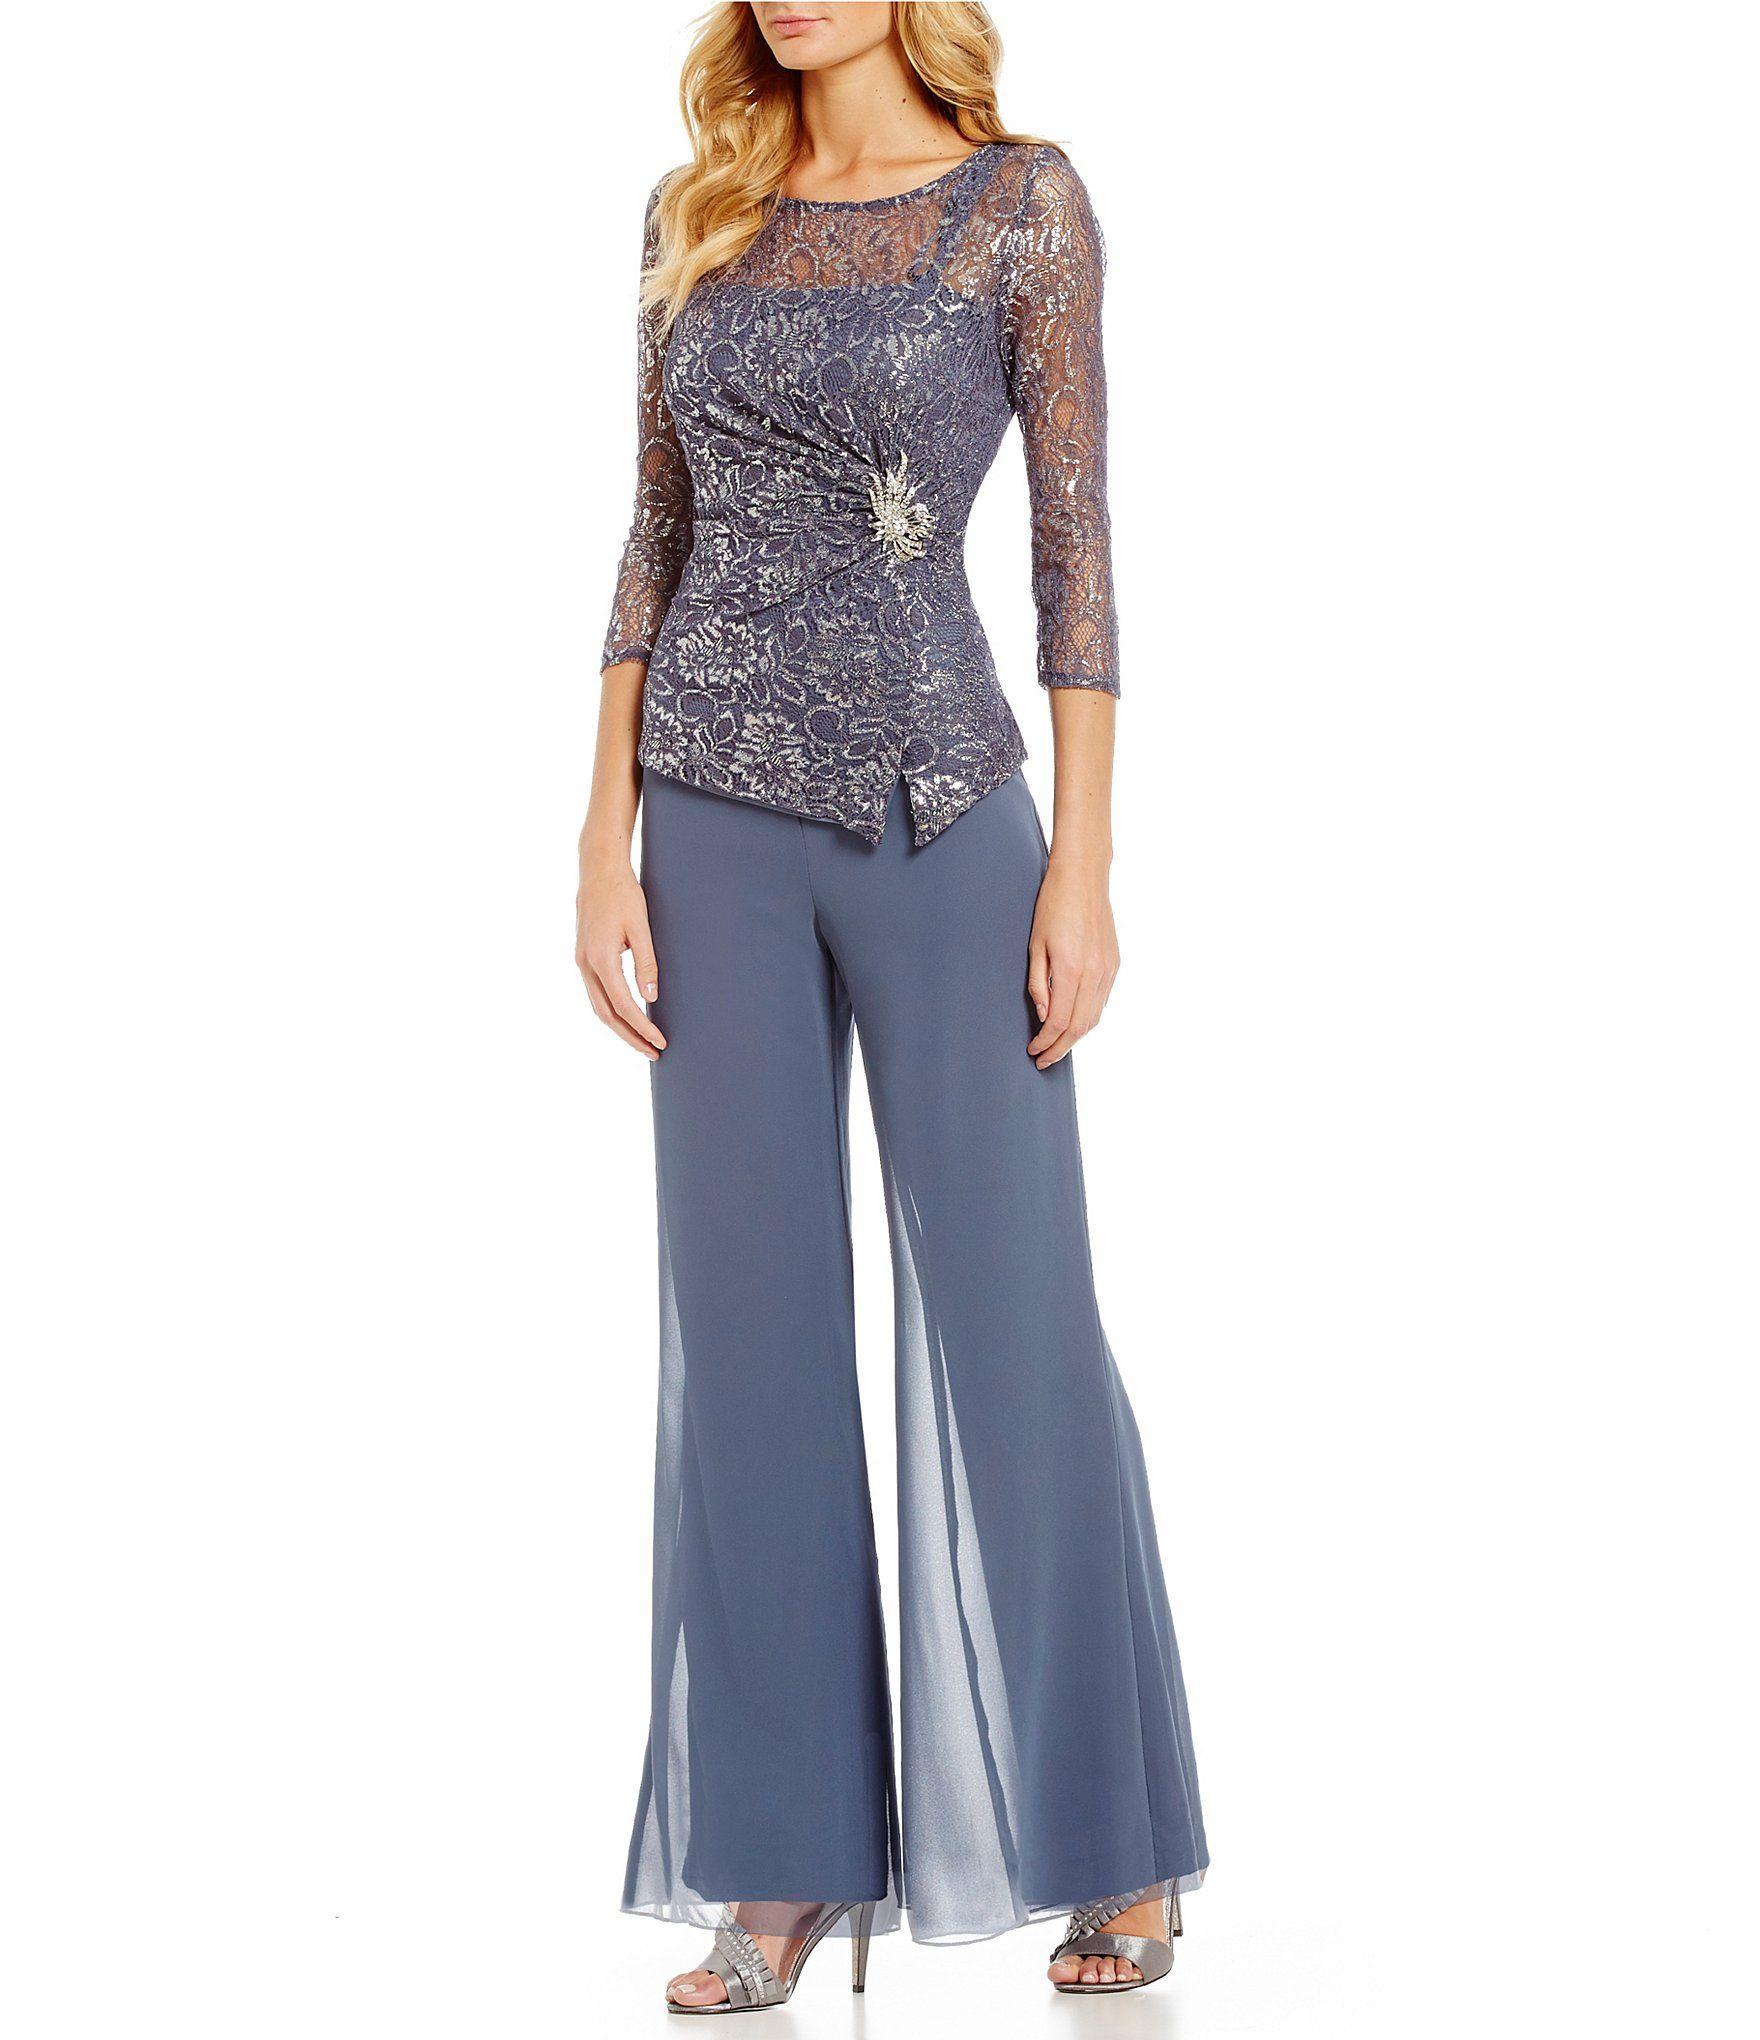 19c42a5fb Emma Street Lace Chiffon 2Piece Pant Set  Dillards Vestidos Elegantes Para  Gorditas